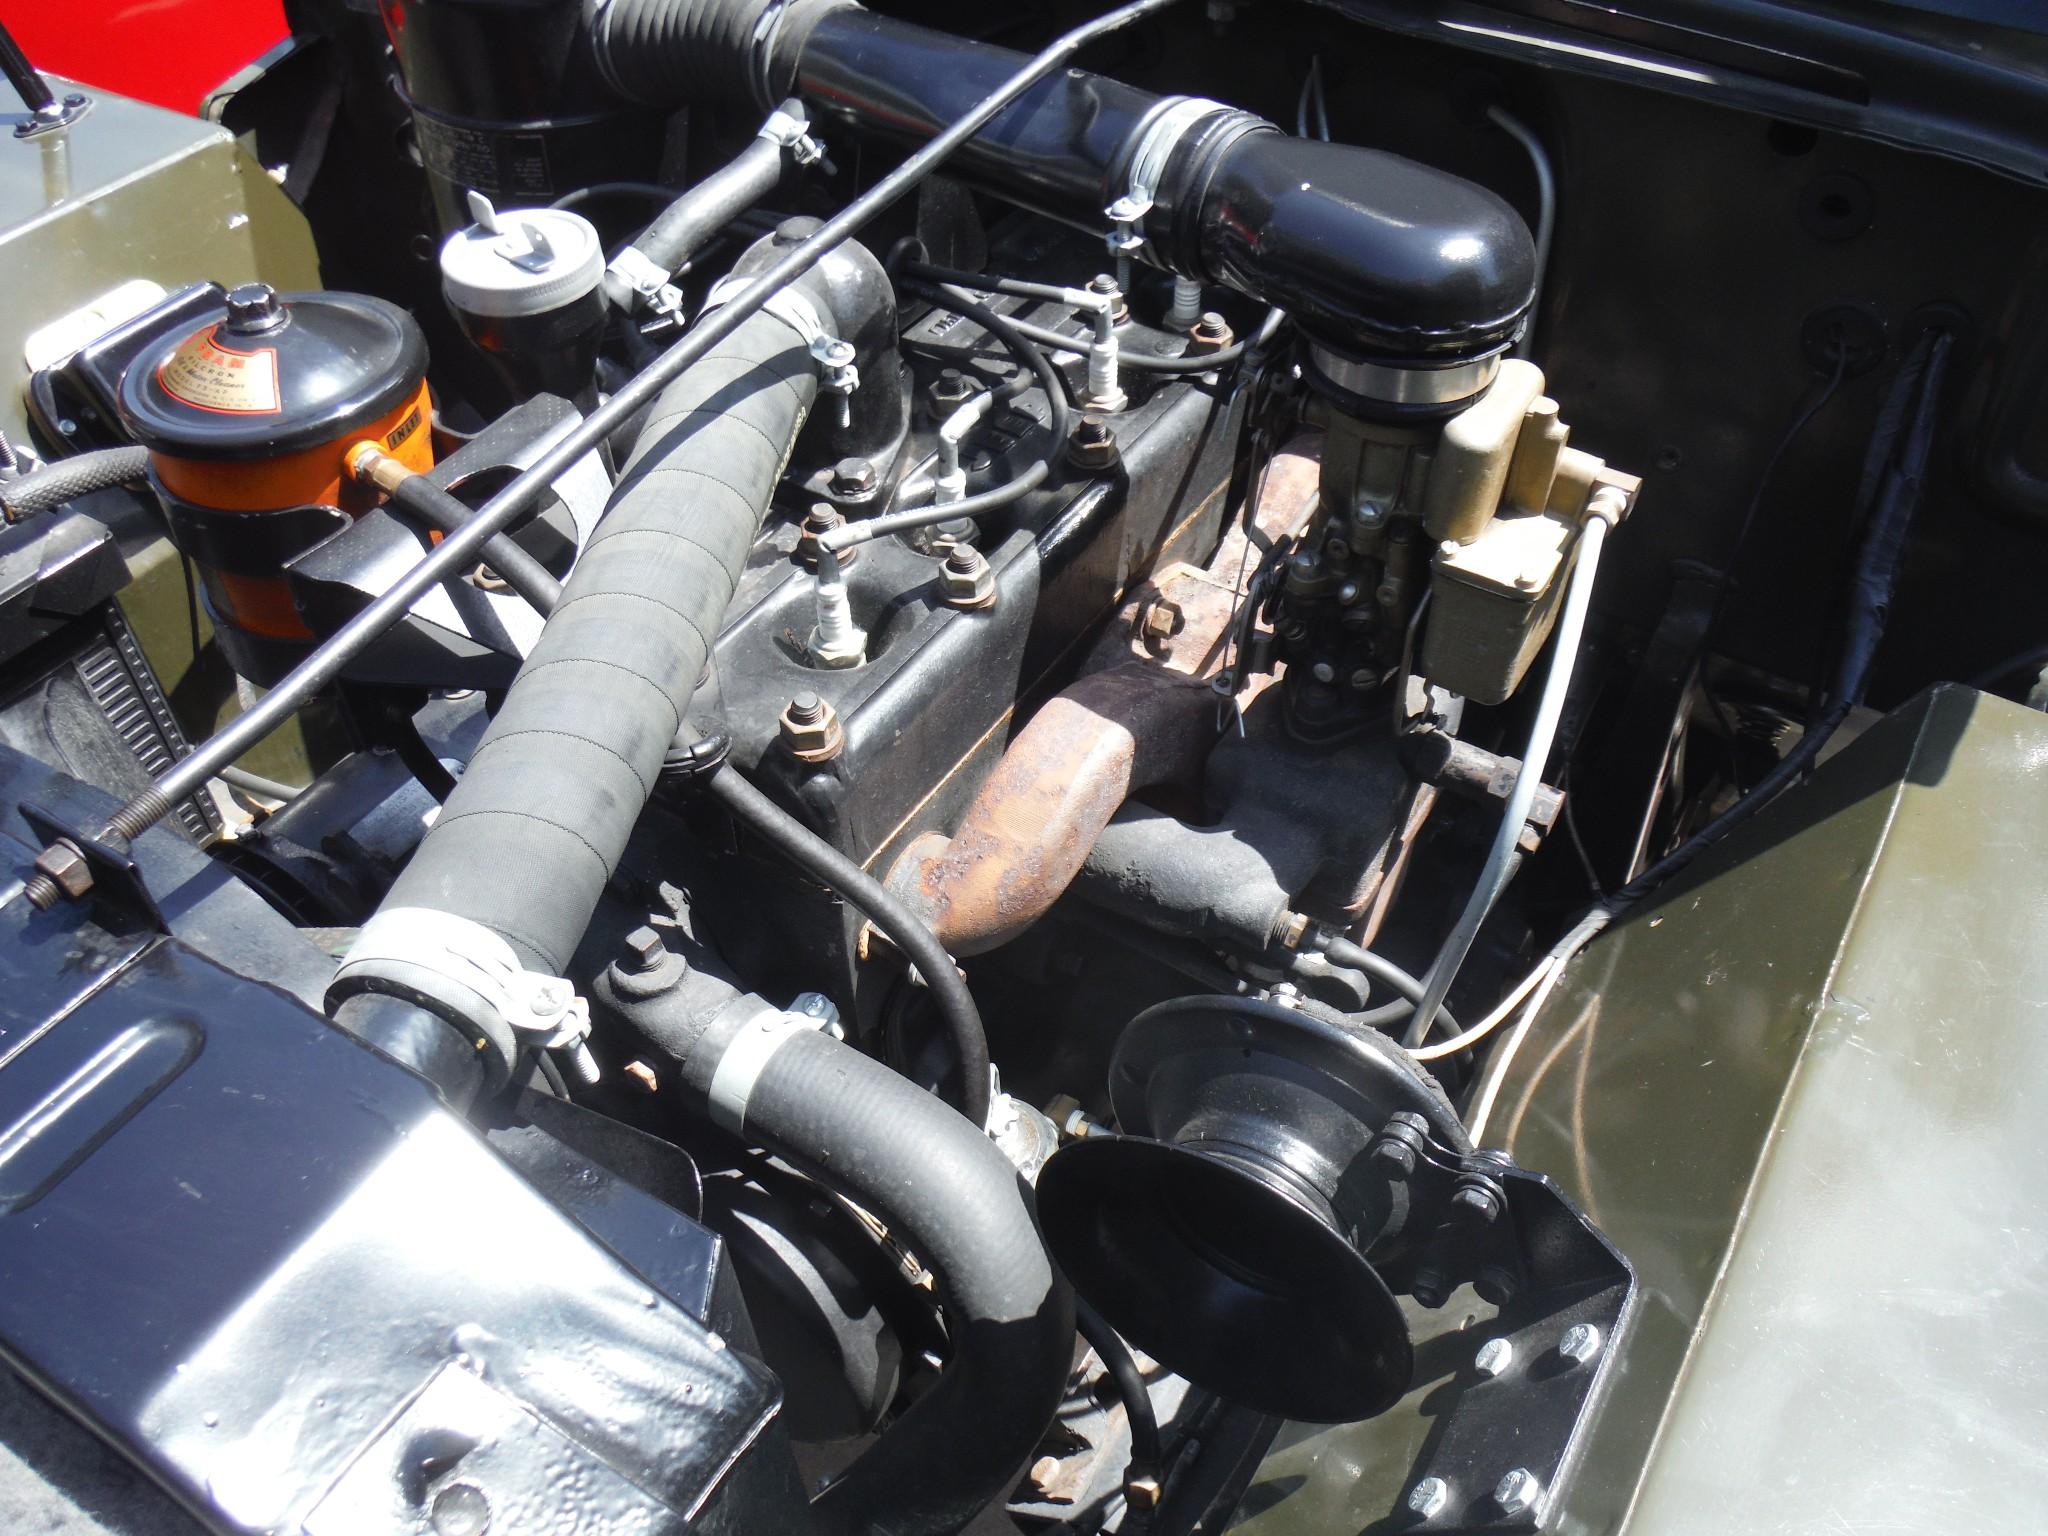 1947 WILLYS CJ2A CUSTOM JEEP - 181069 |Jeep Cj2a Engines